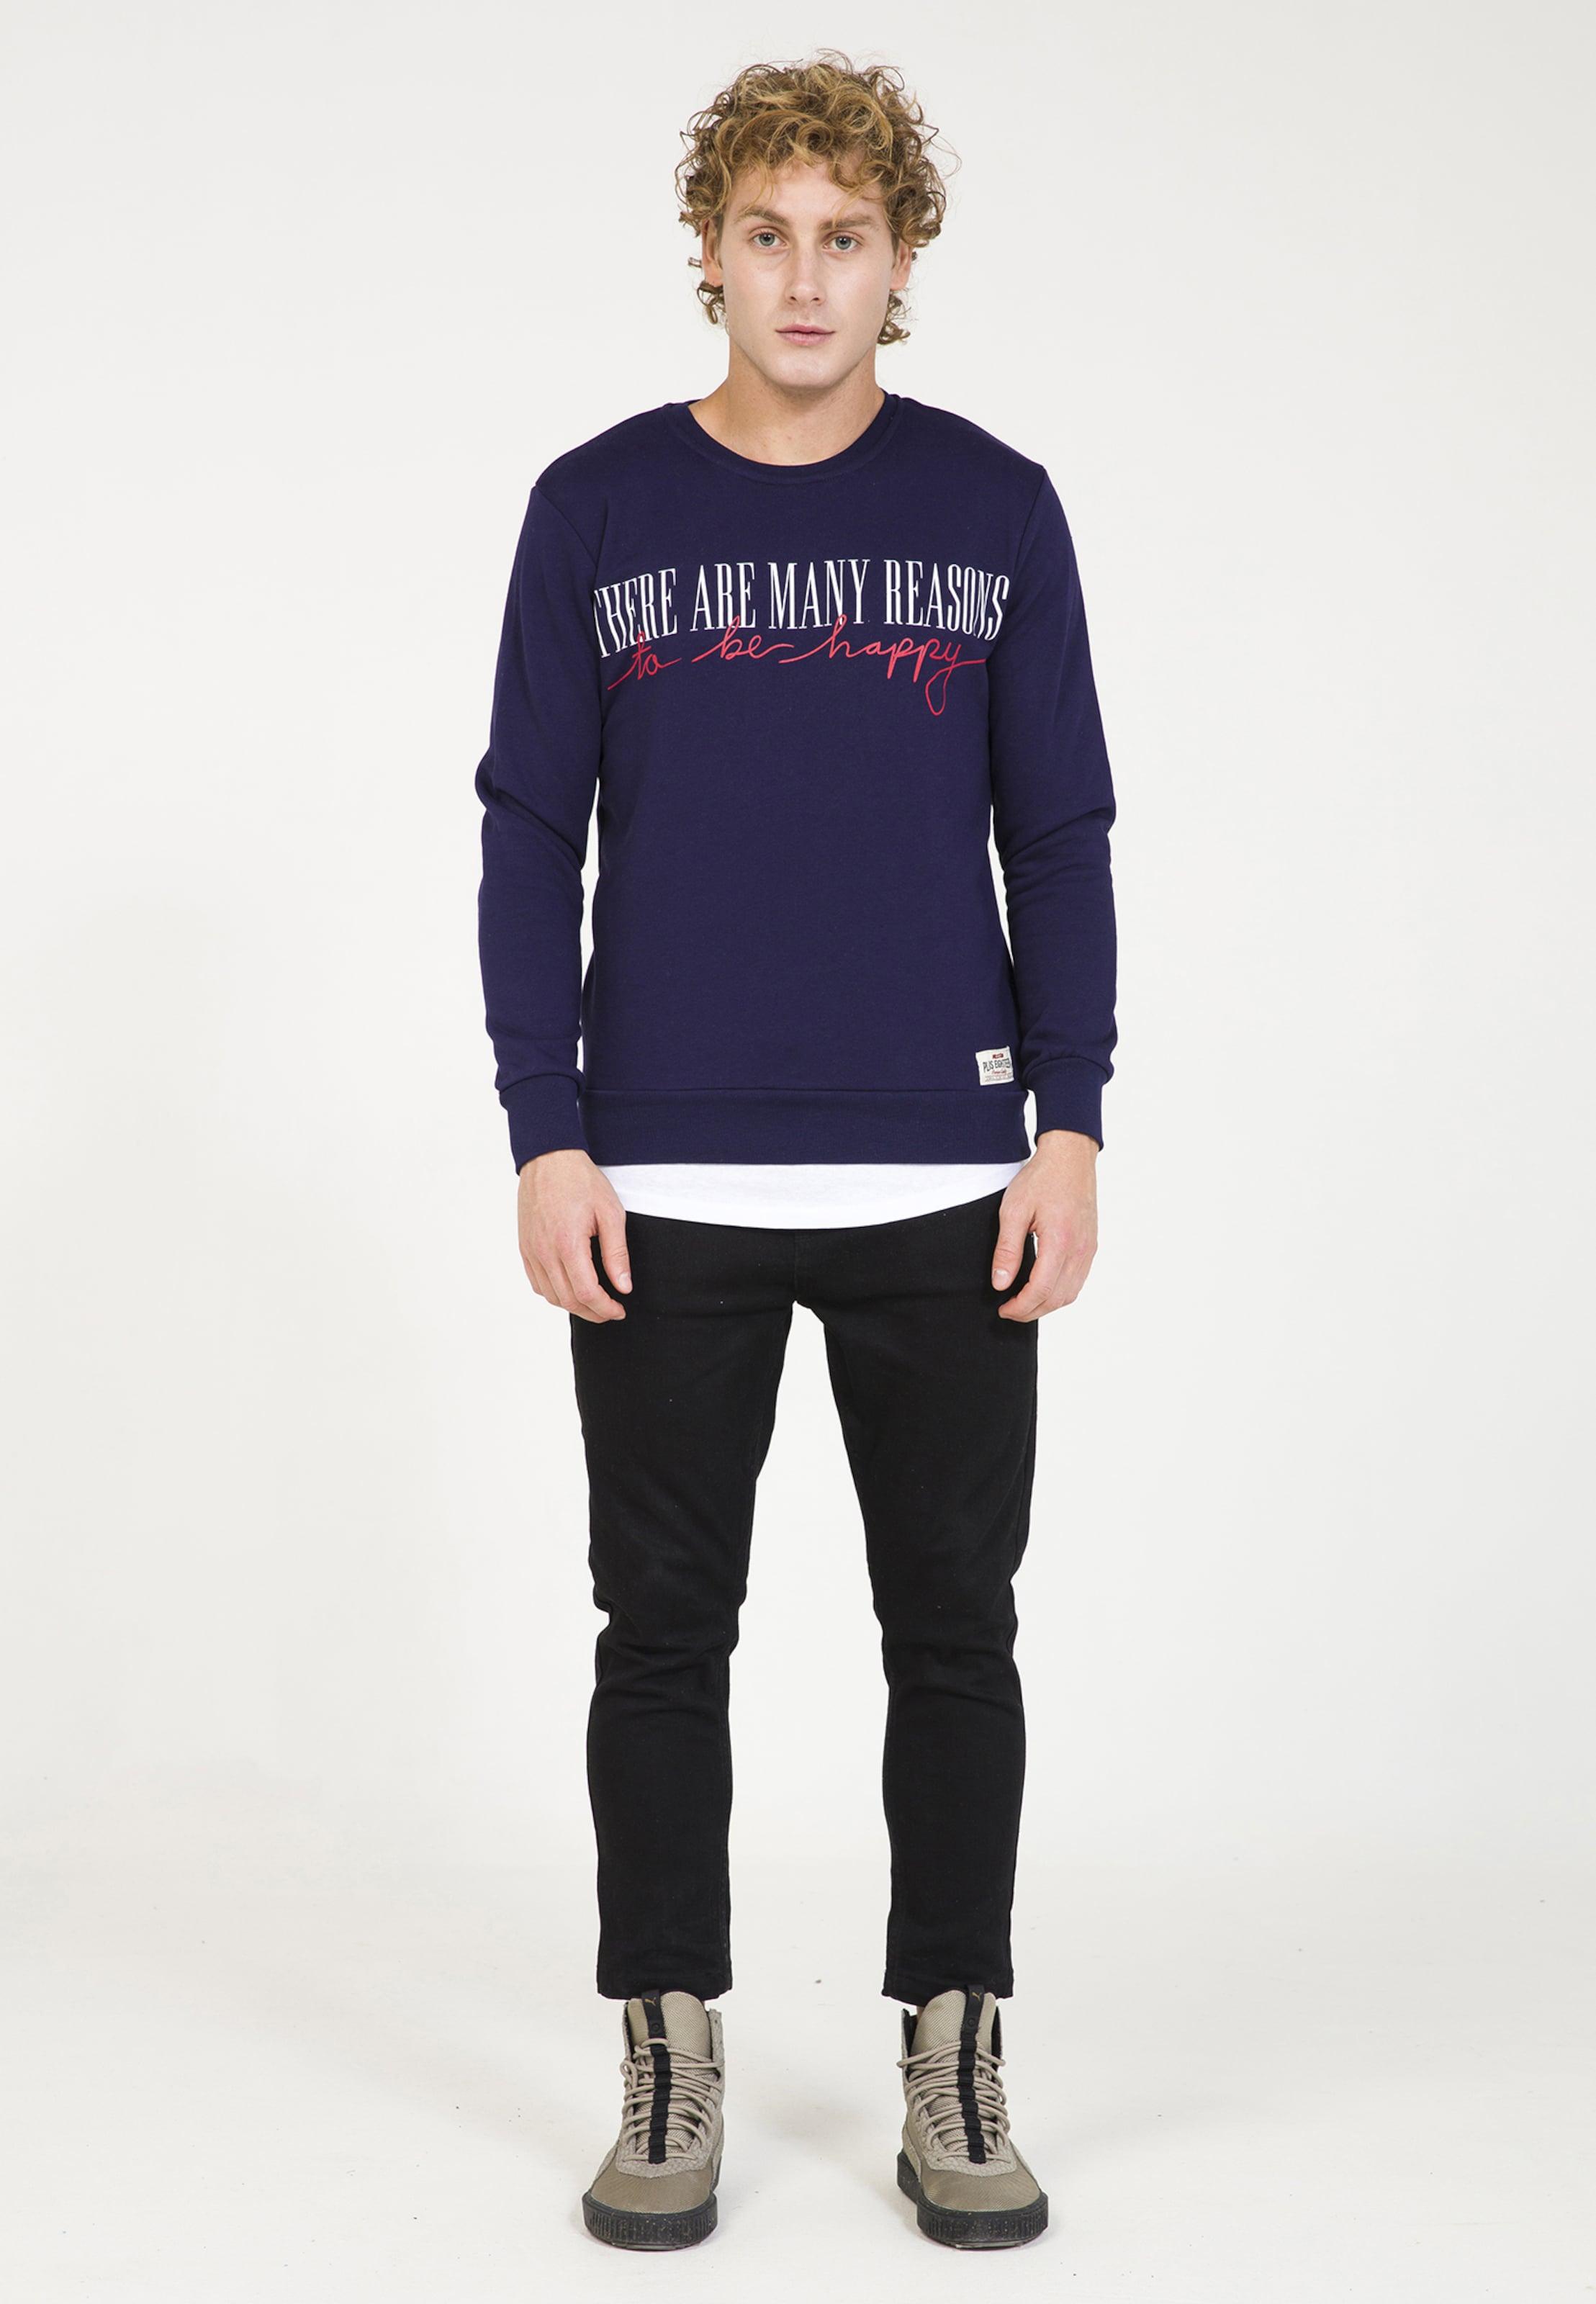 Marine In Eighteen Plus Sweatshirt Plus Eighteen nNm80w